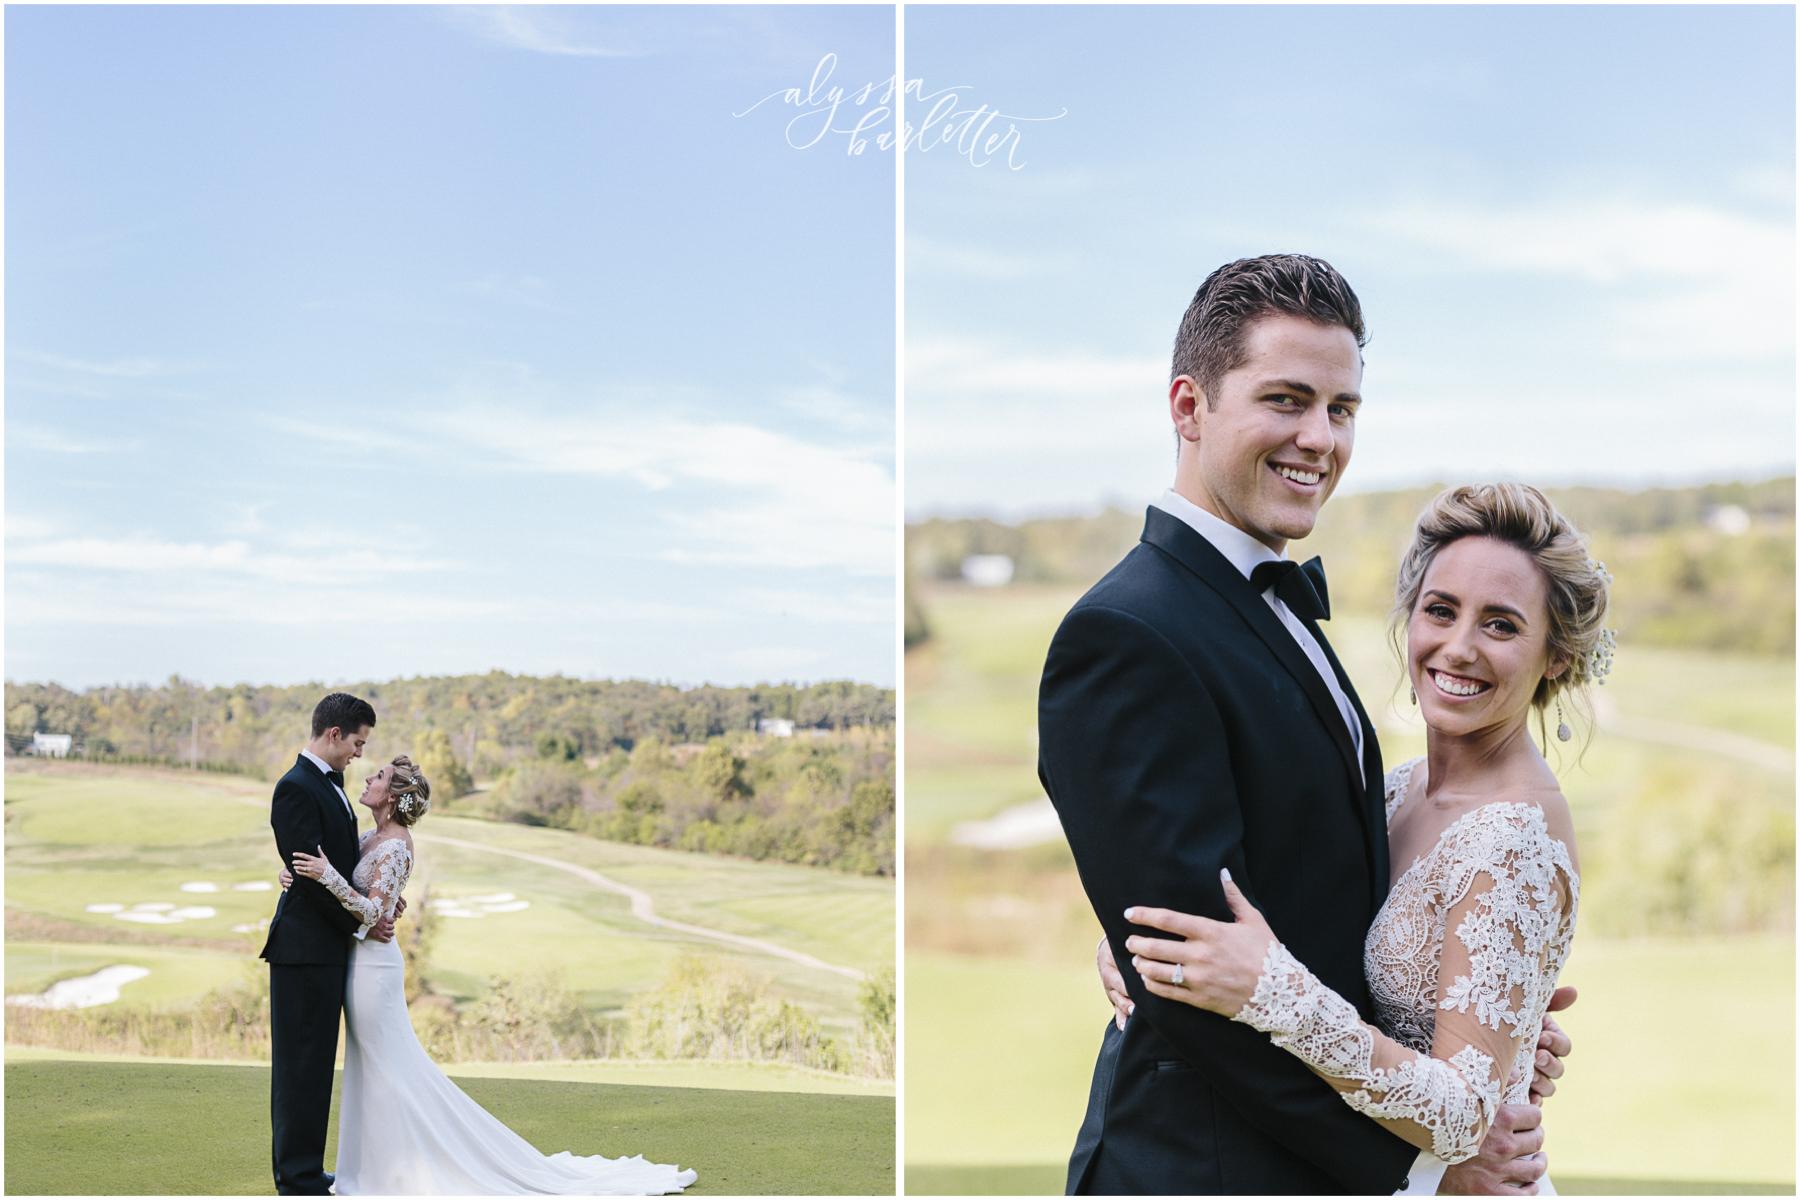 alyssa barletter photography fayetteville arkansas wedding photos micah and colin-1-33.jpg